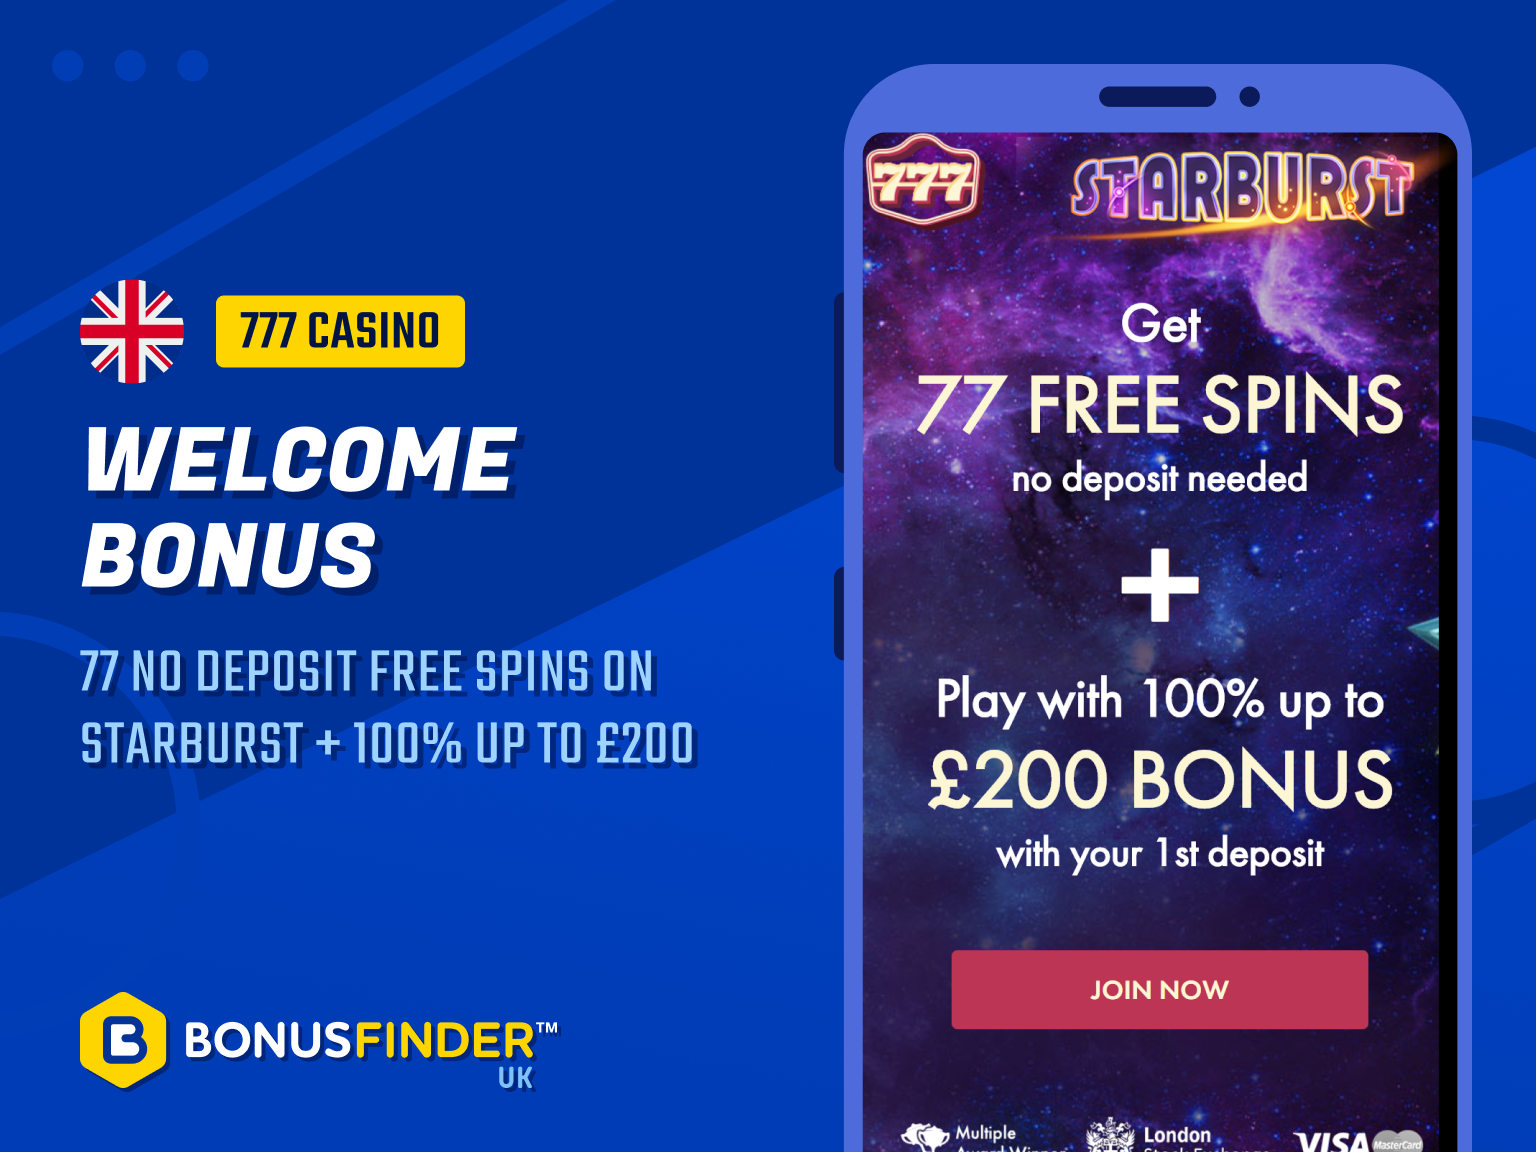 777 casino free spins no deposit bonus